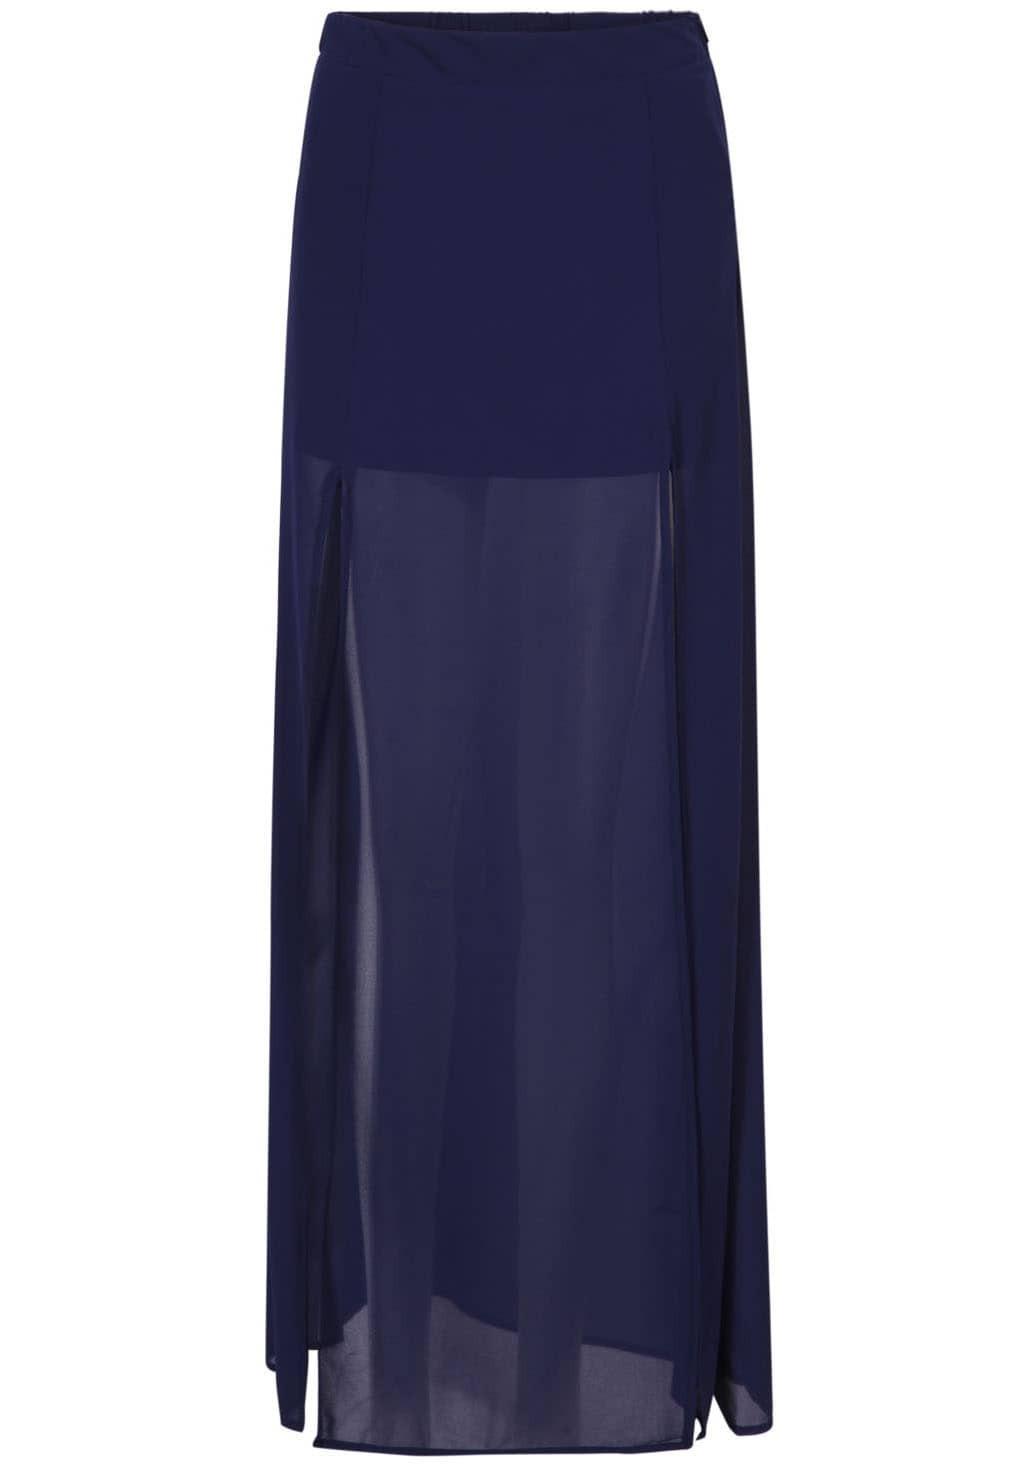 royal blue sheer split chiffon skirt shein sheinside